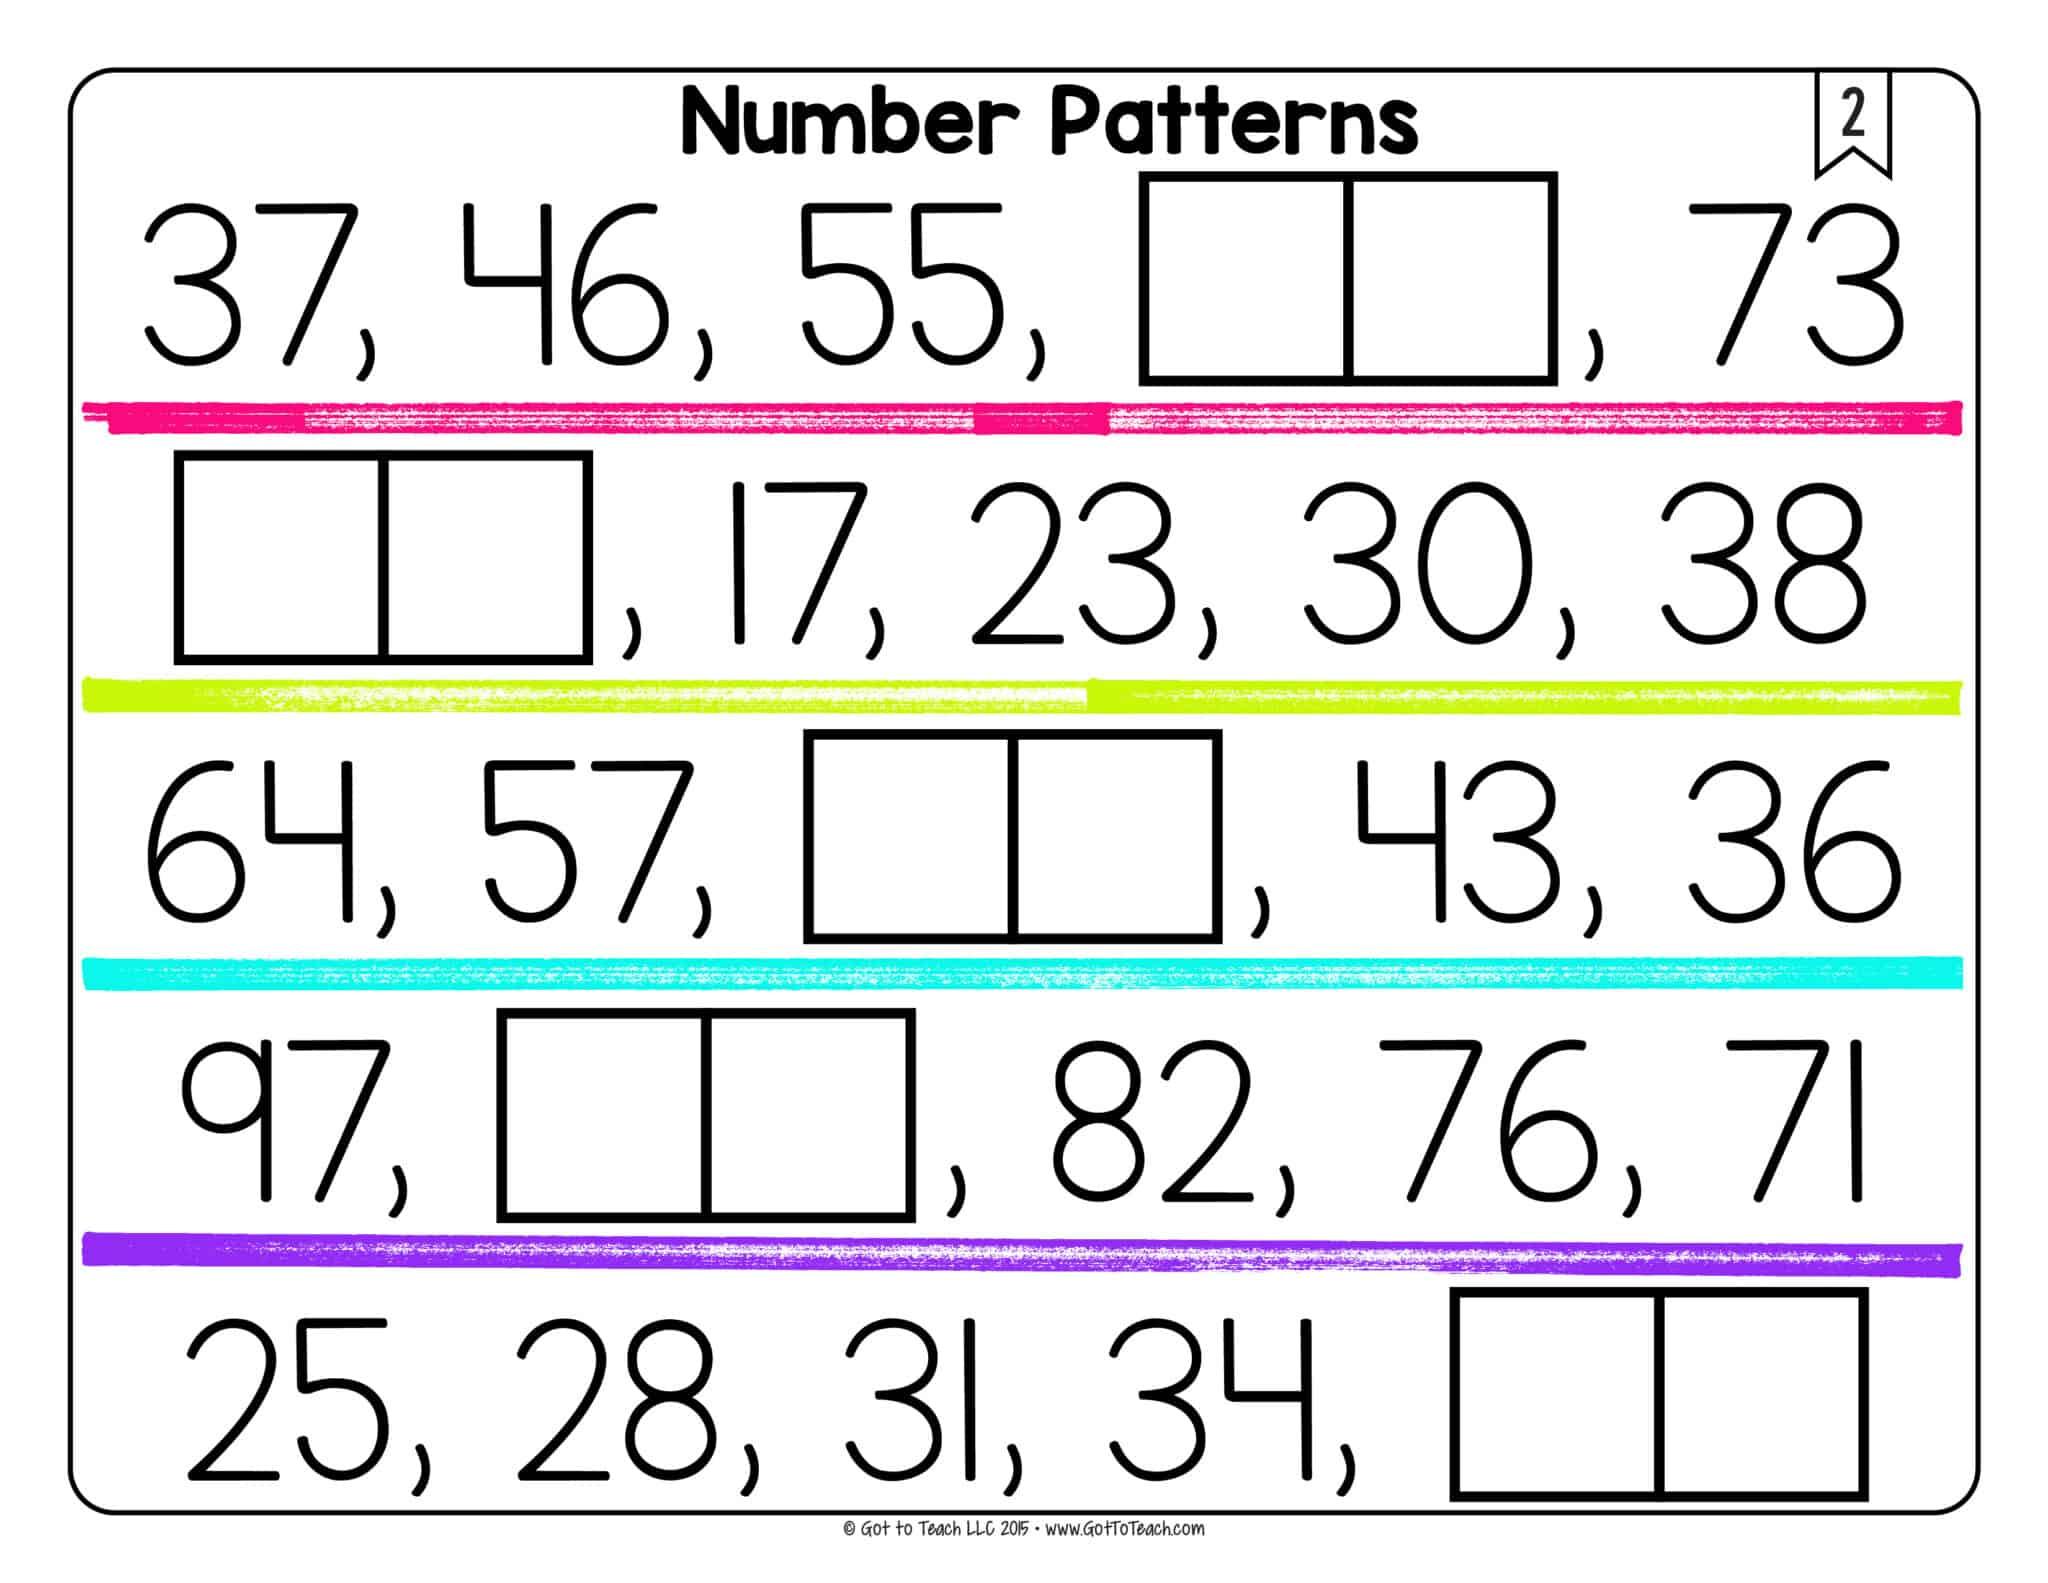 Analyze Number Patterns